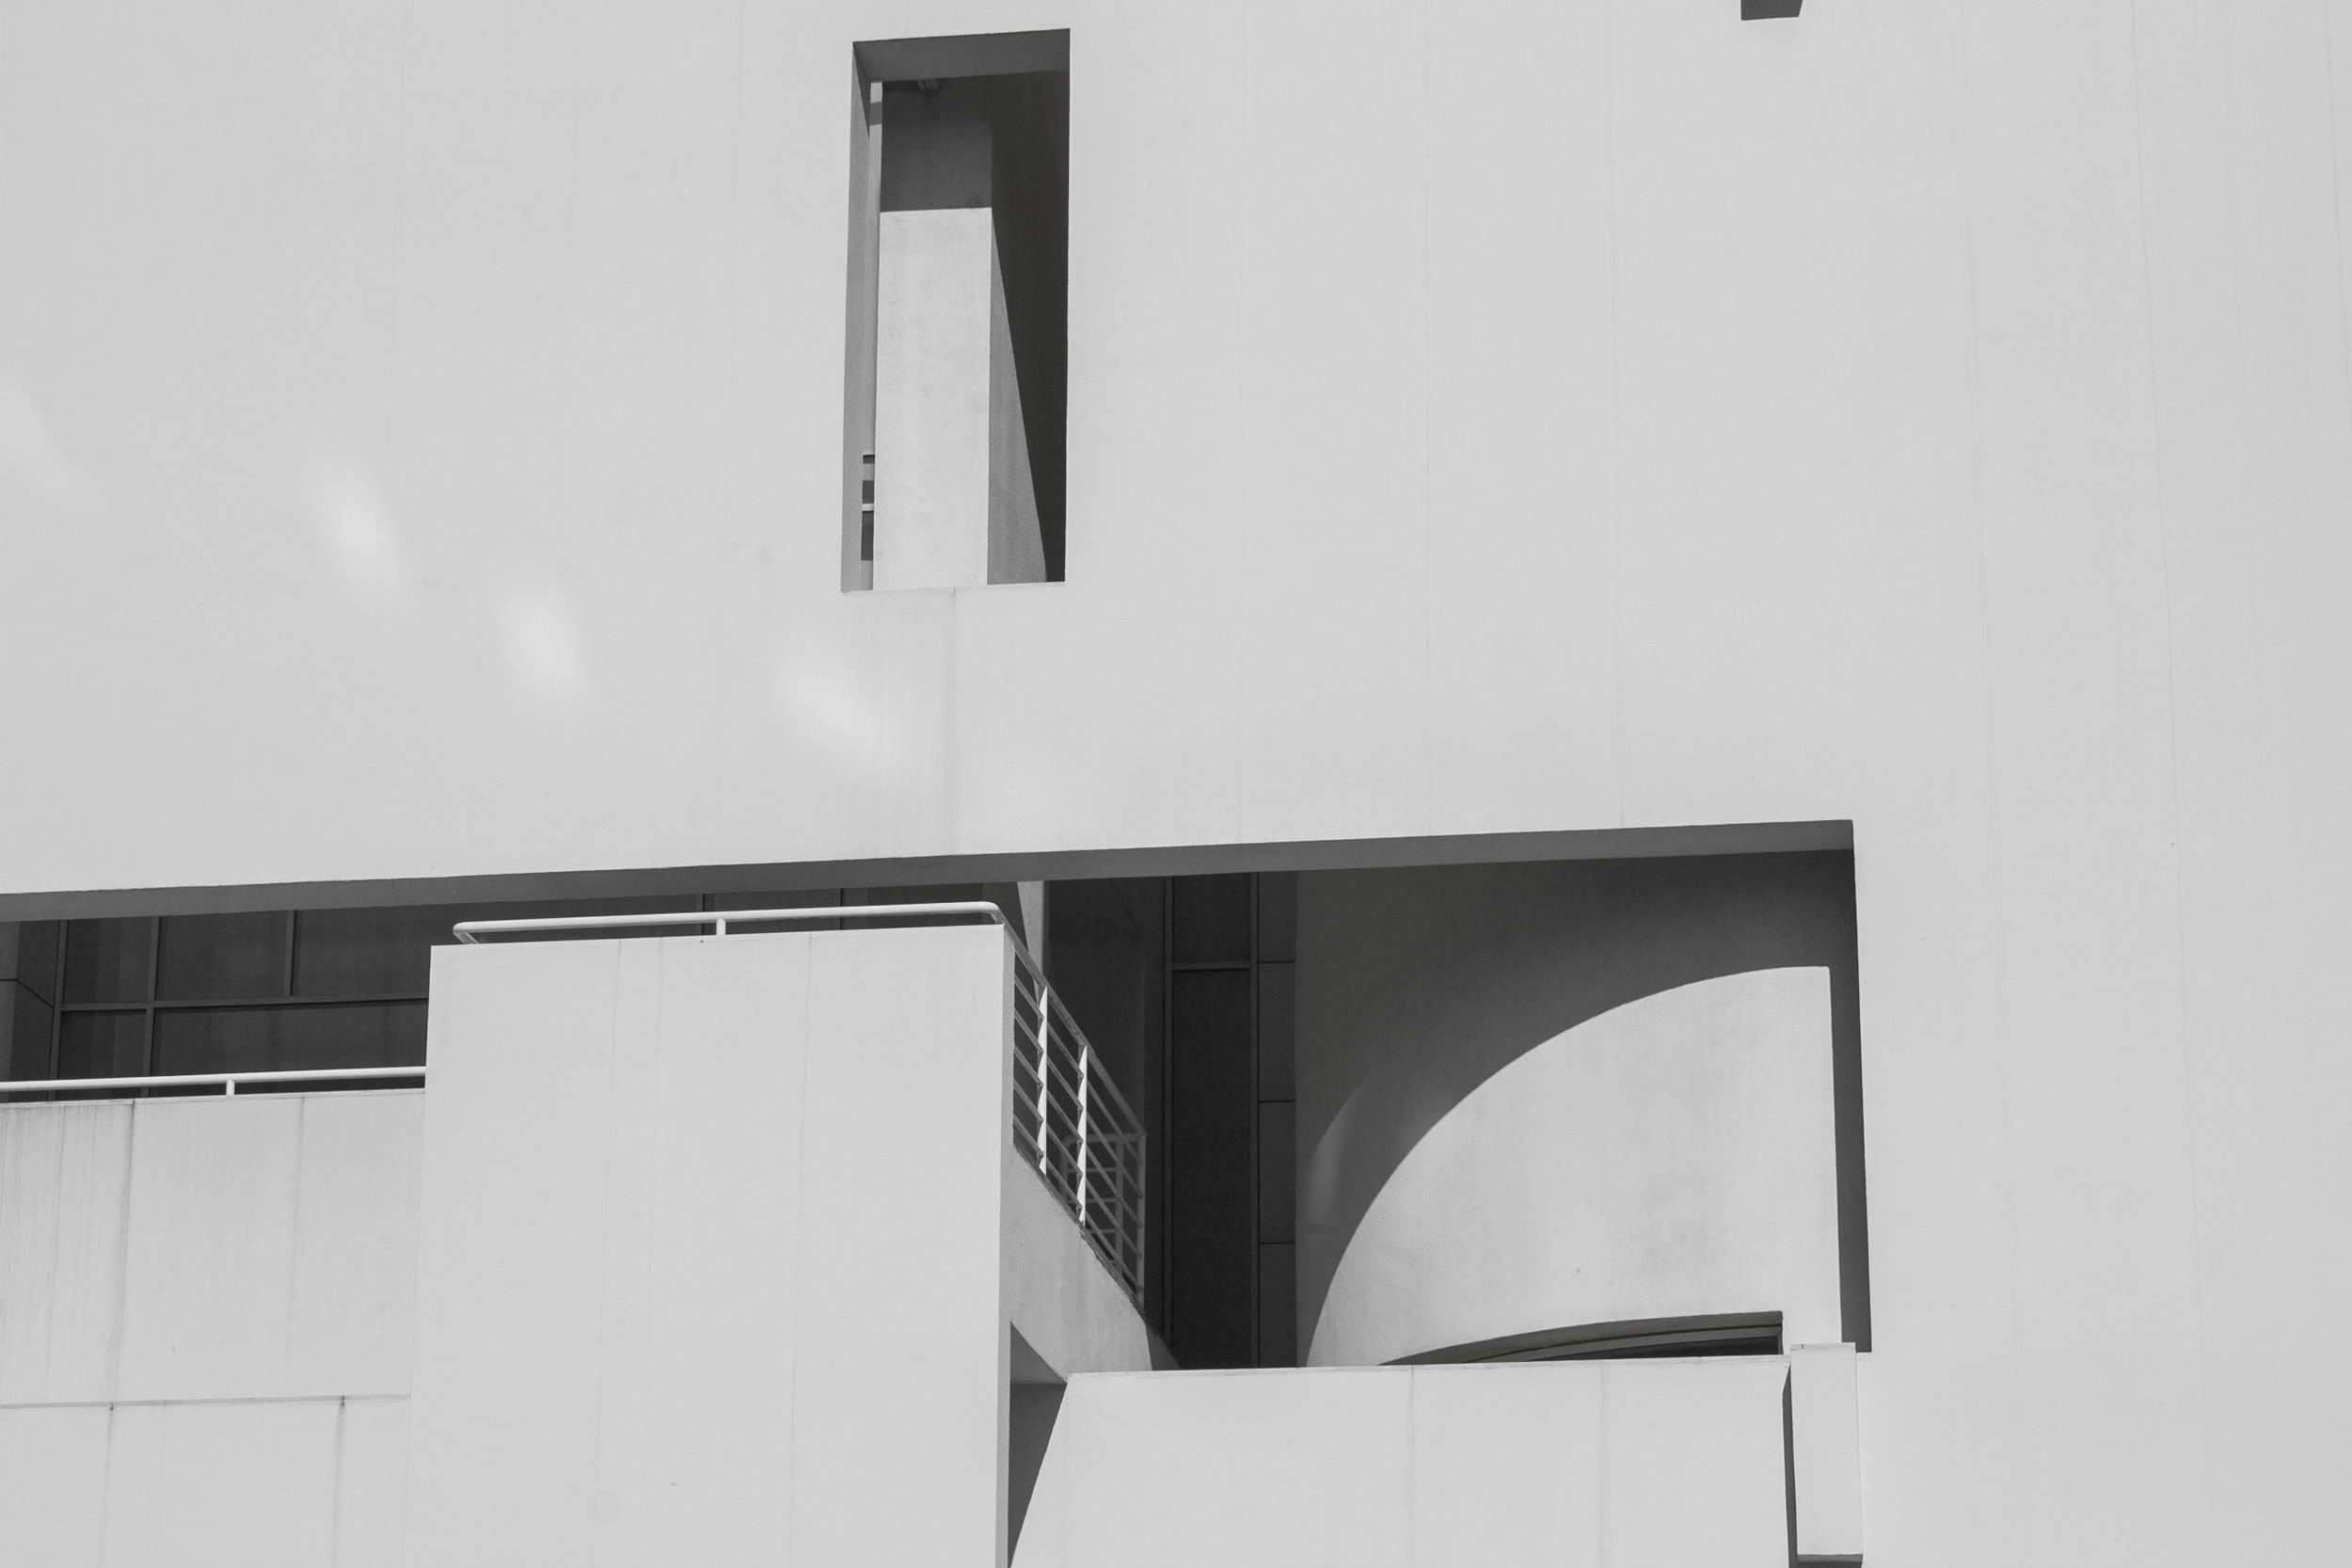 barcelona_18.jpg